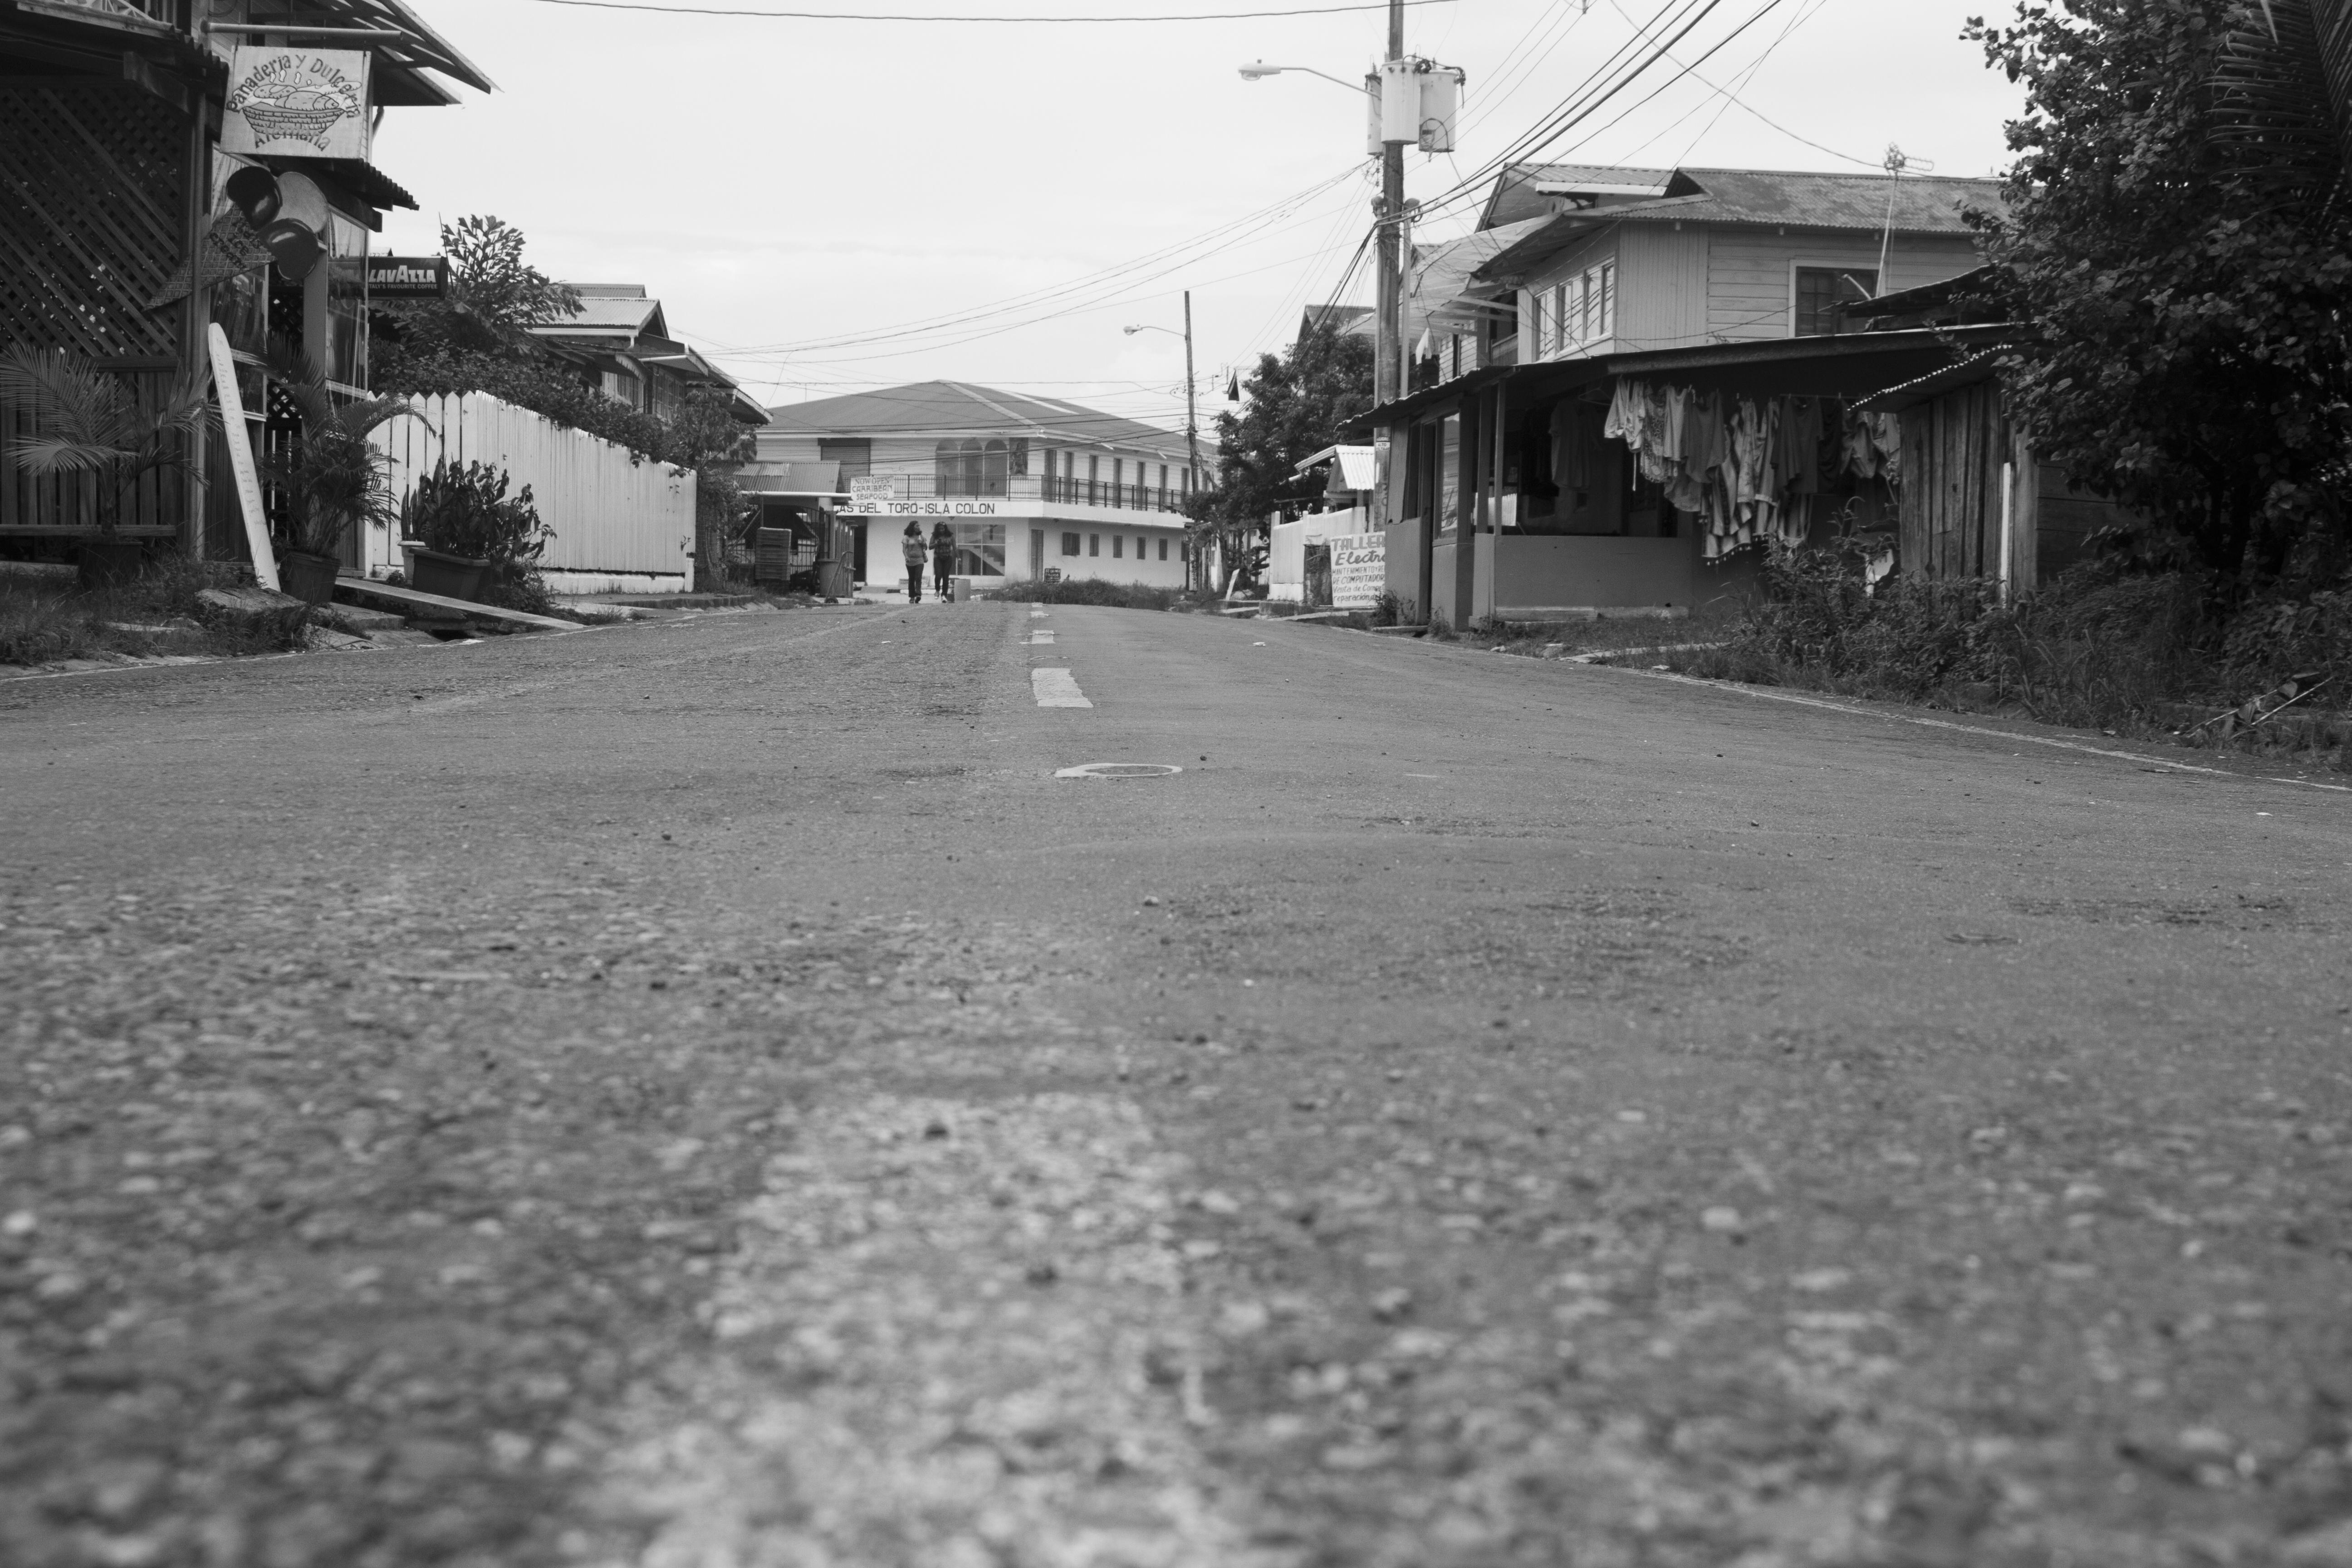 Streets Bocas del toro